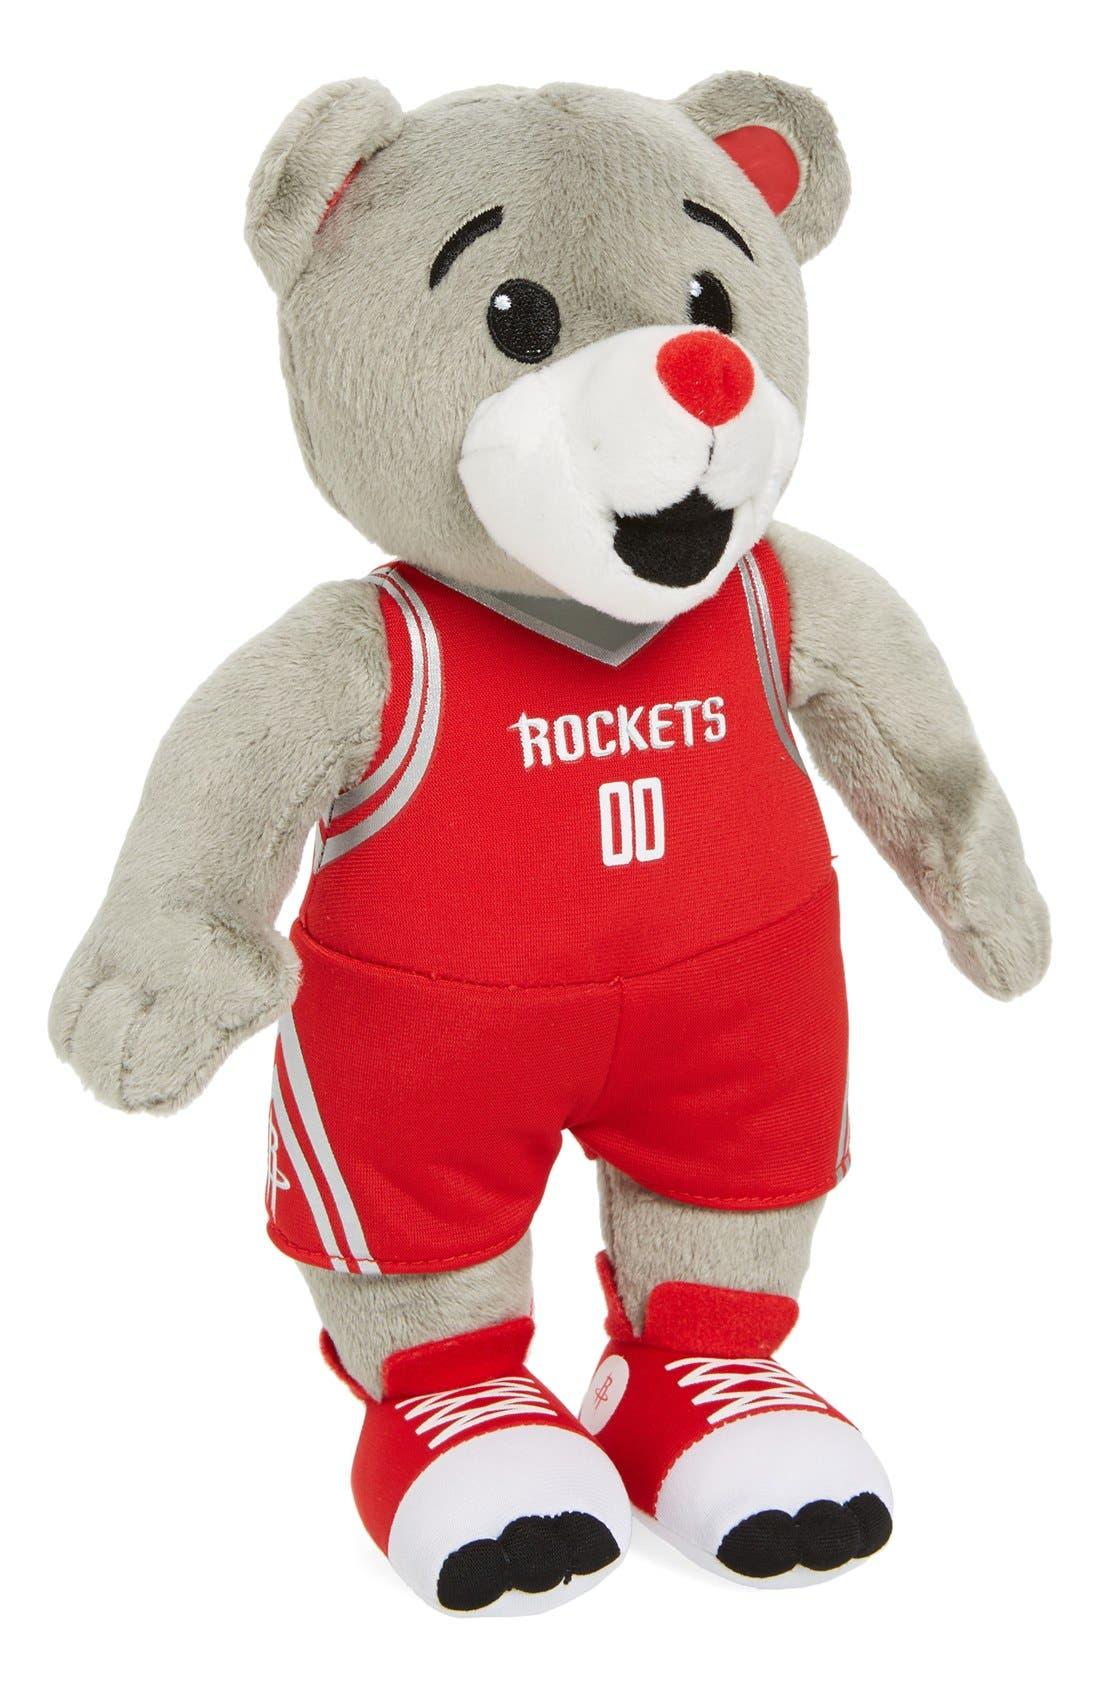 BLEACHER CREATURES Houston Rockets - Clutch Plush Toy